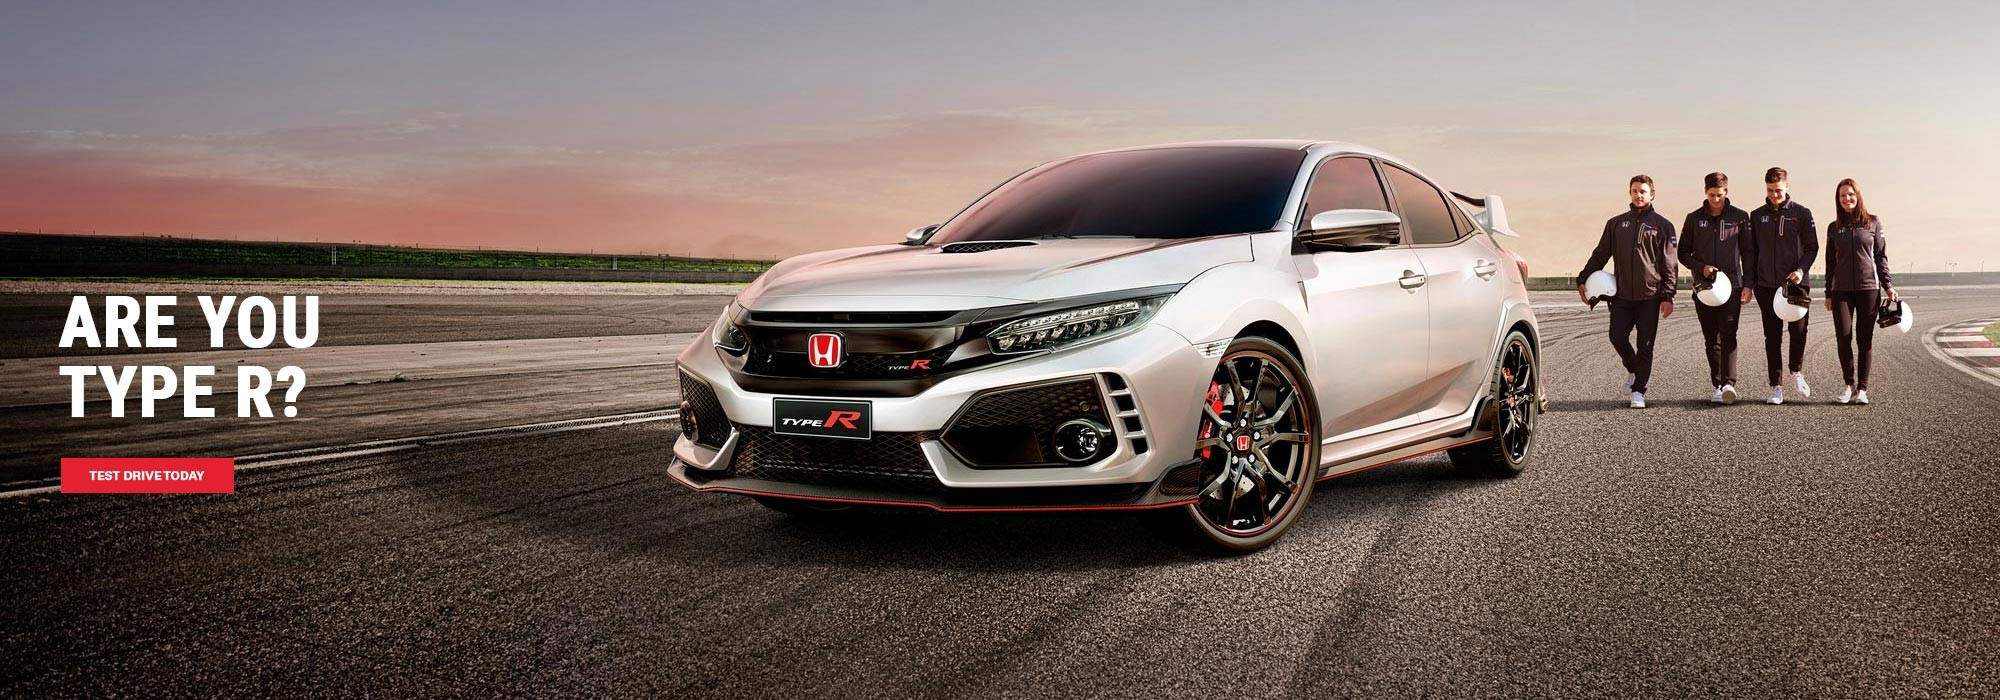 Profil Honda Trading Indonesia PT | Qerja